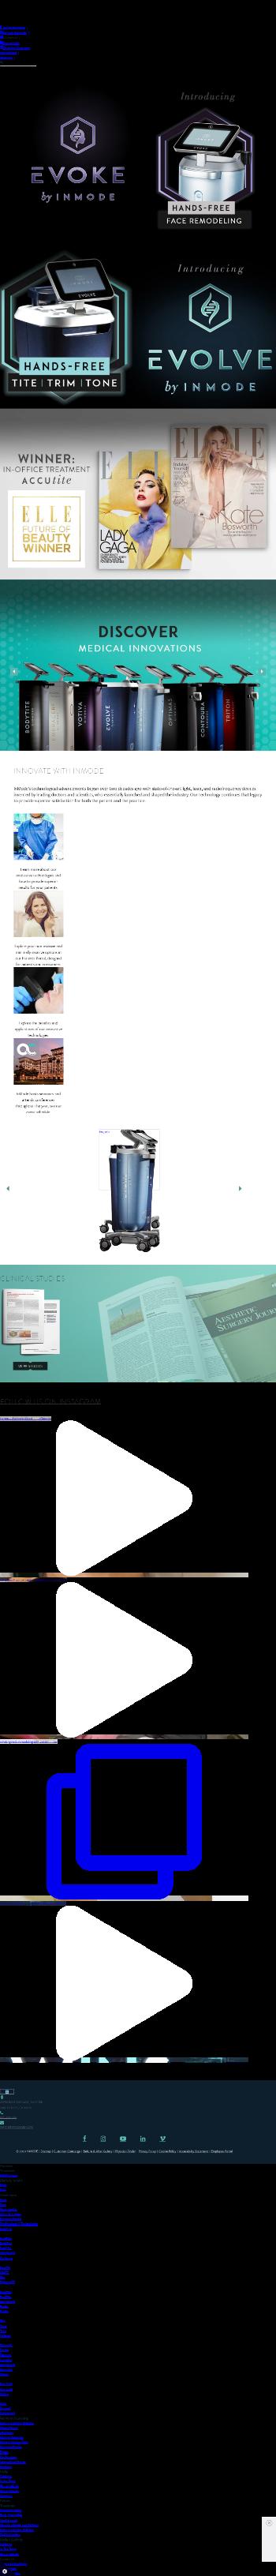 InMode Ltd. Website Screenshot